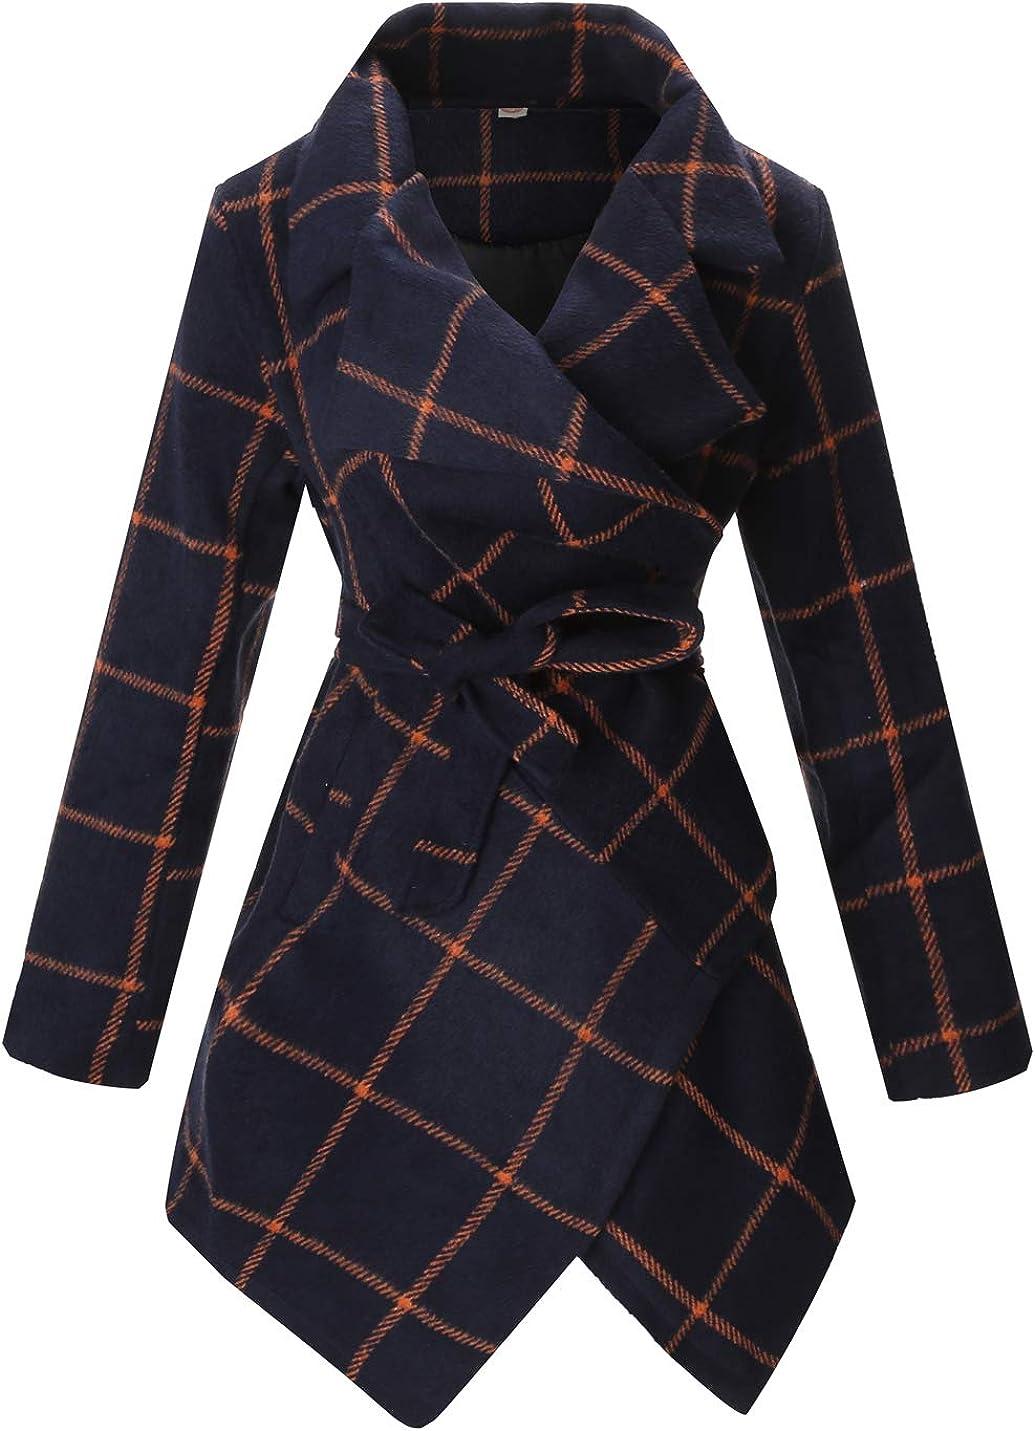 PLREOSEVNTE Women's Turn Down Collar Grid Coat Belted Wool Blend Coat Asymmetric Hem Wrap Coat